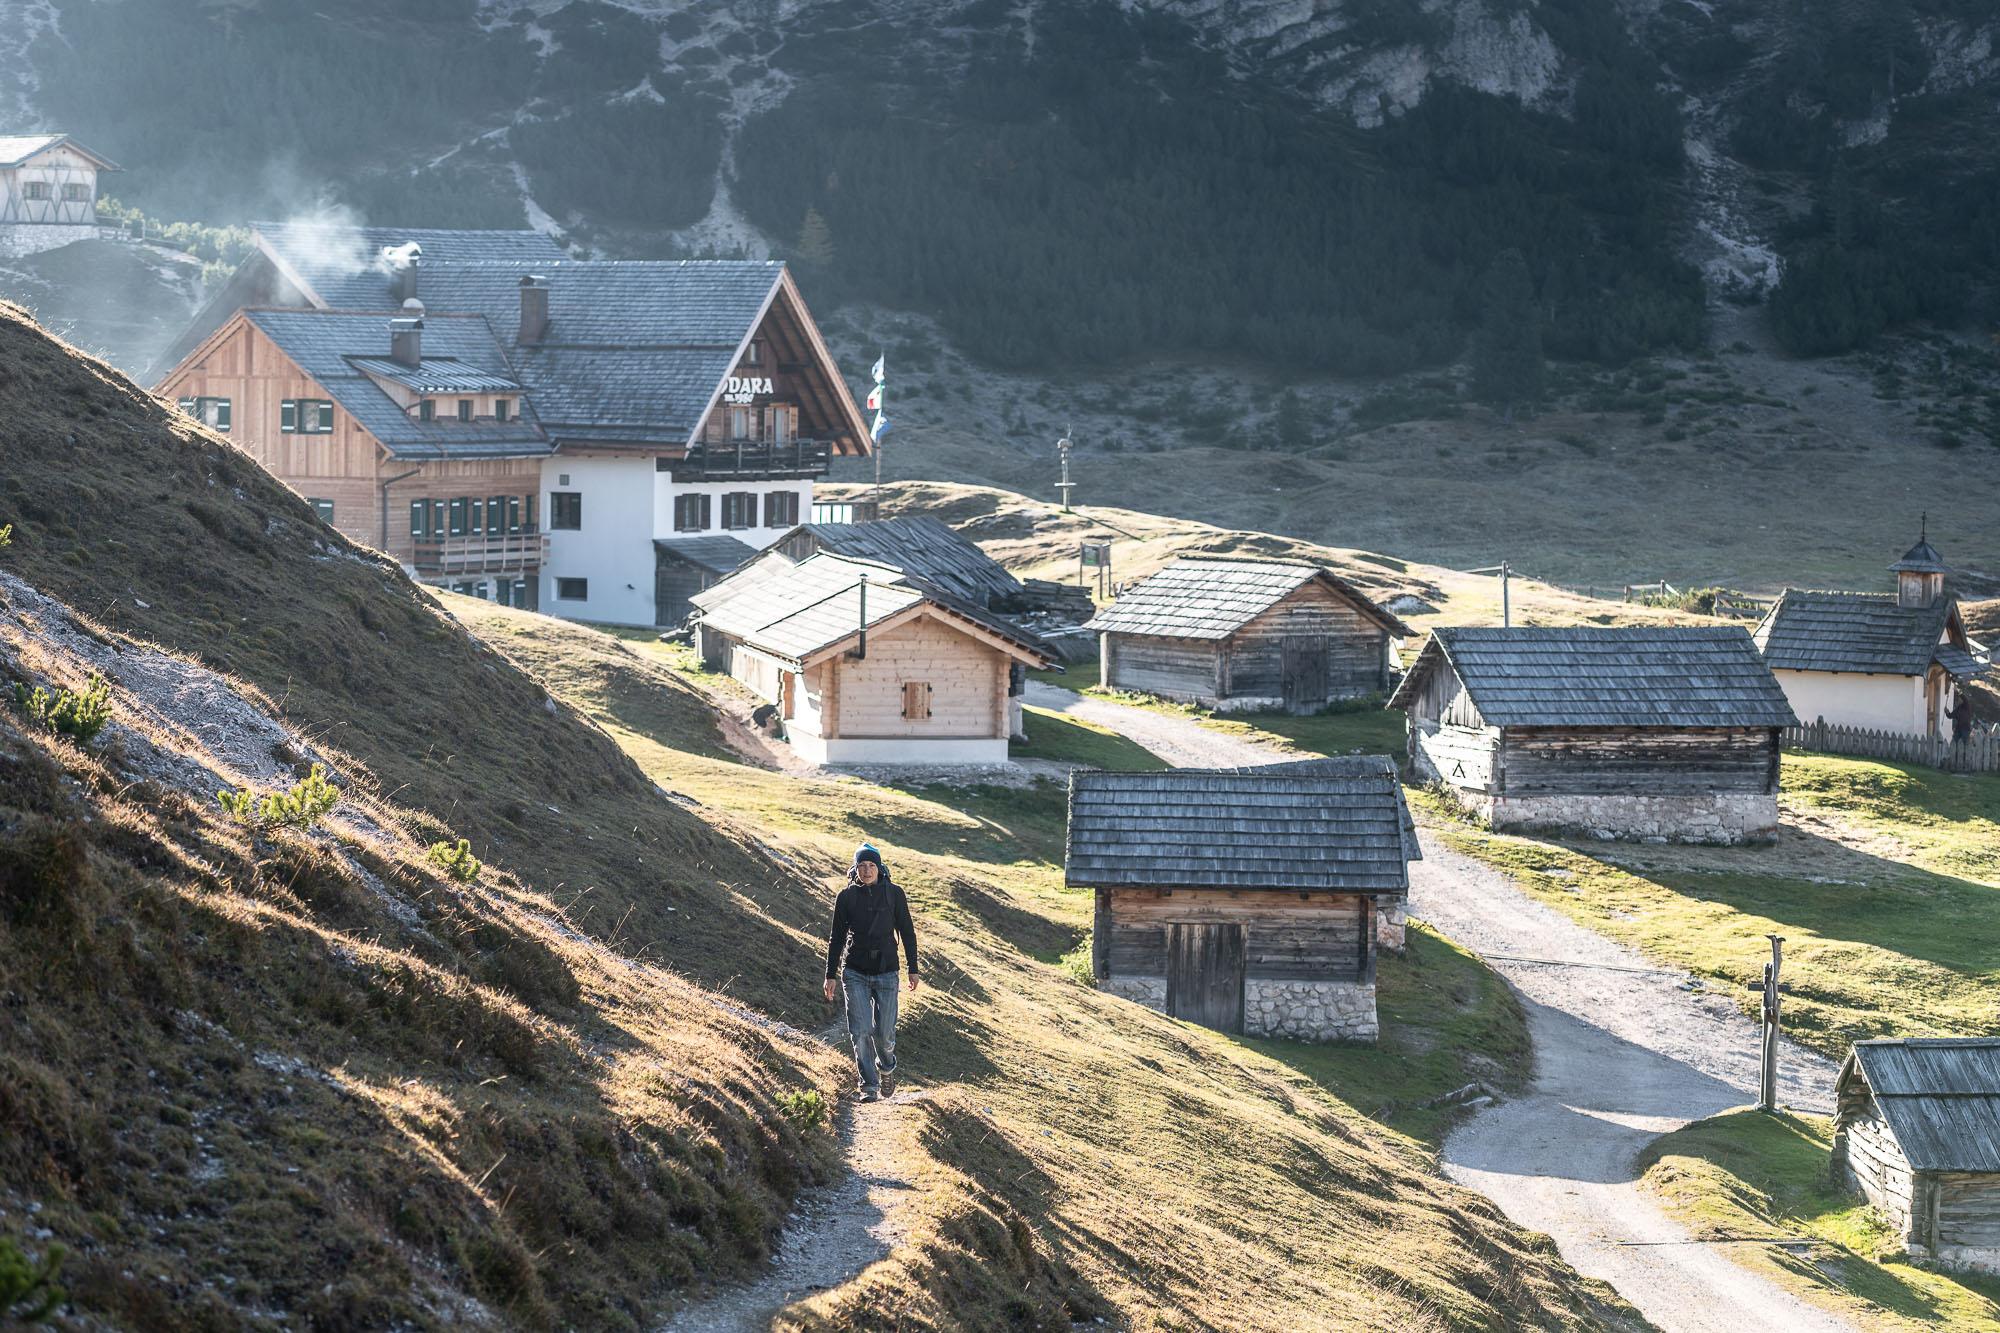 L'Alpe di Fodara: sulla sinistra il Rifugio Fodara _ PHOTO  ©GIUSEPPEGHEDINA